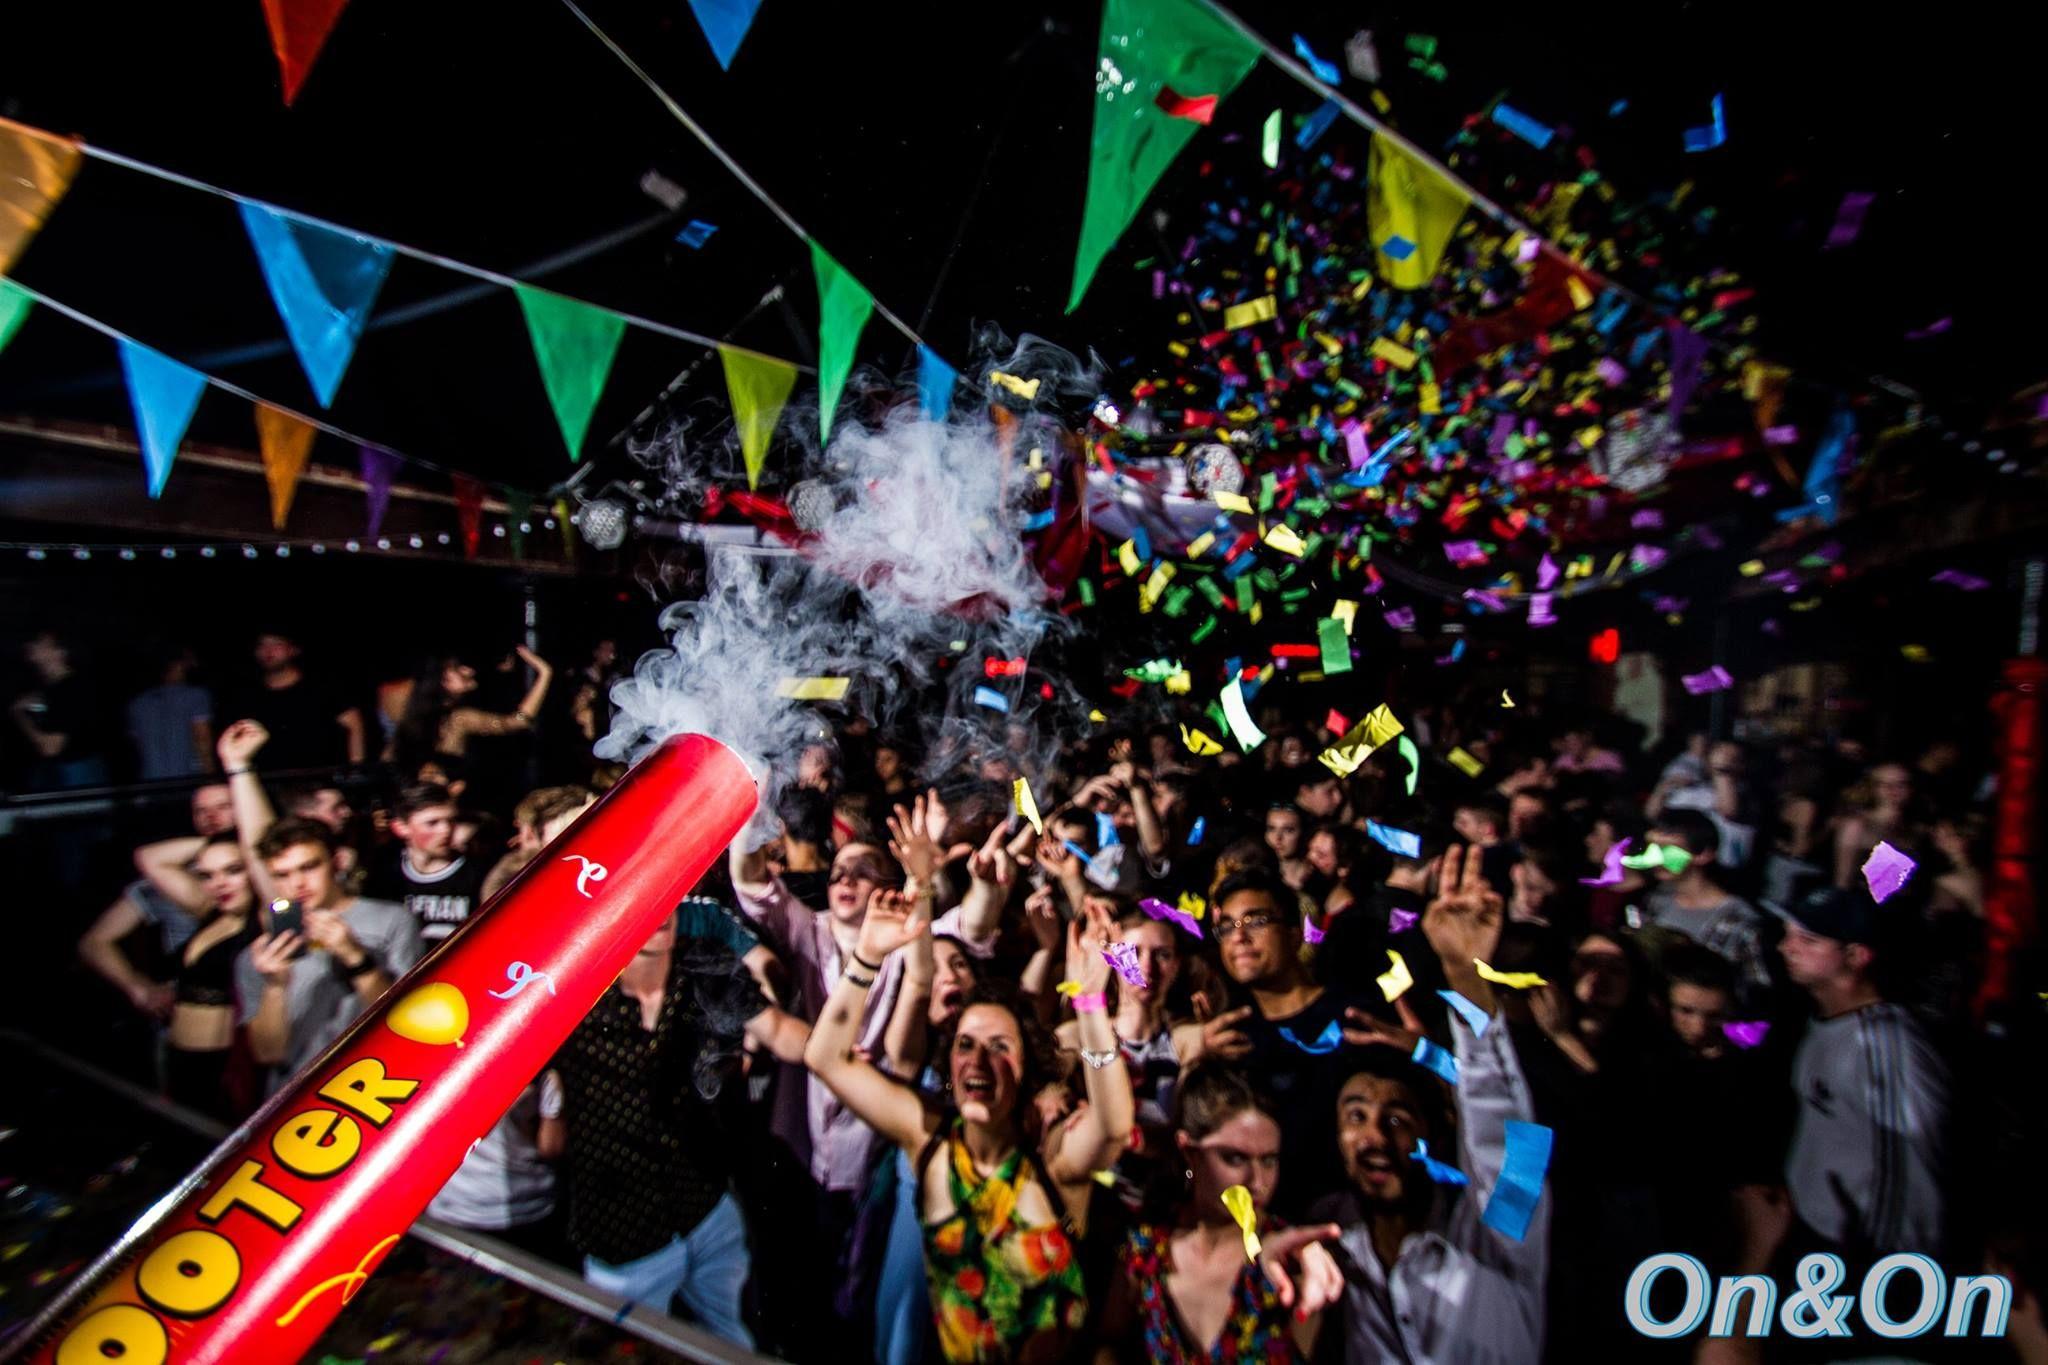 Image may contain: Festival, Club, Night Life, Crowd, Confetti, Paper, Human, Person